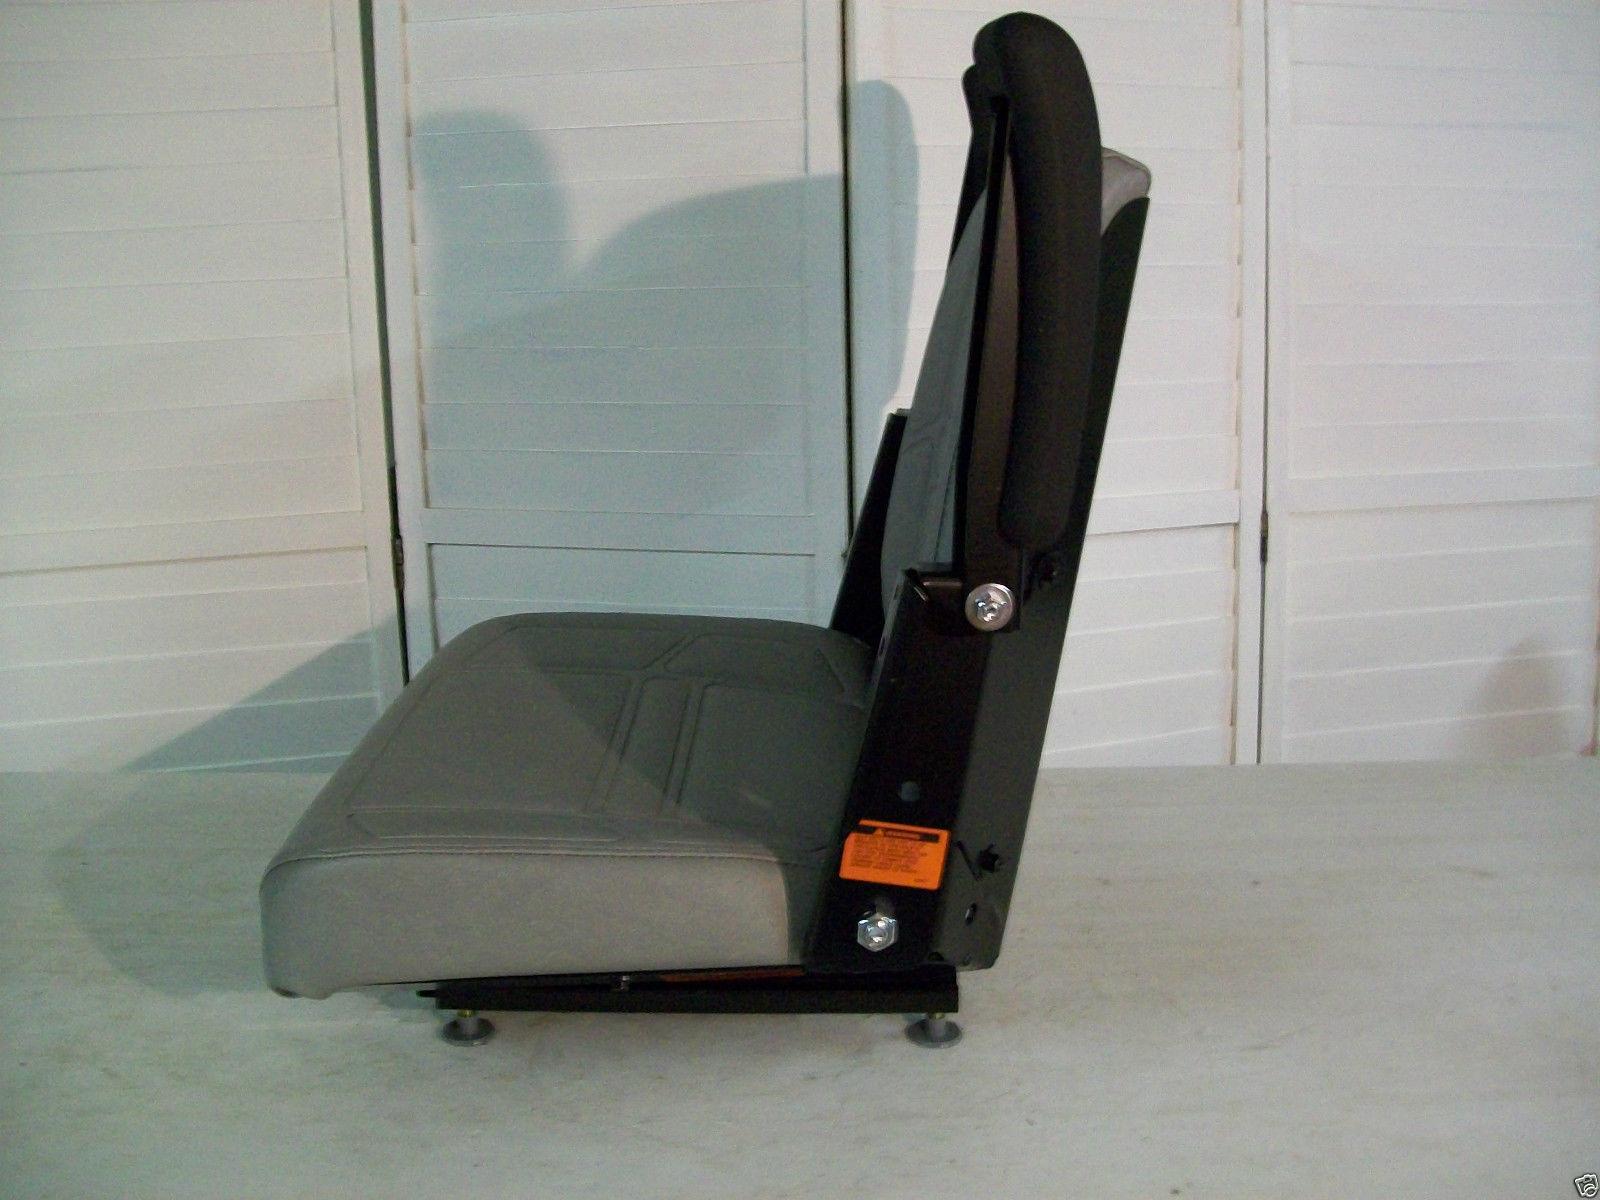 Zero Turn Mowers For Sale >> GRAY HIGH BACK SEAT BUNTON, BOBCAT, DIXIE, SNAPPER, TORO, EXMARK ZERO TURN MOWER #LN - Seat ...